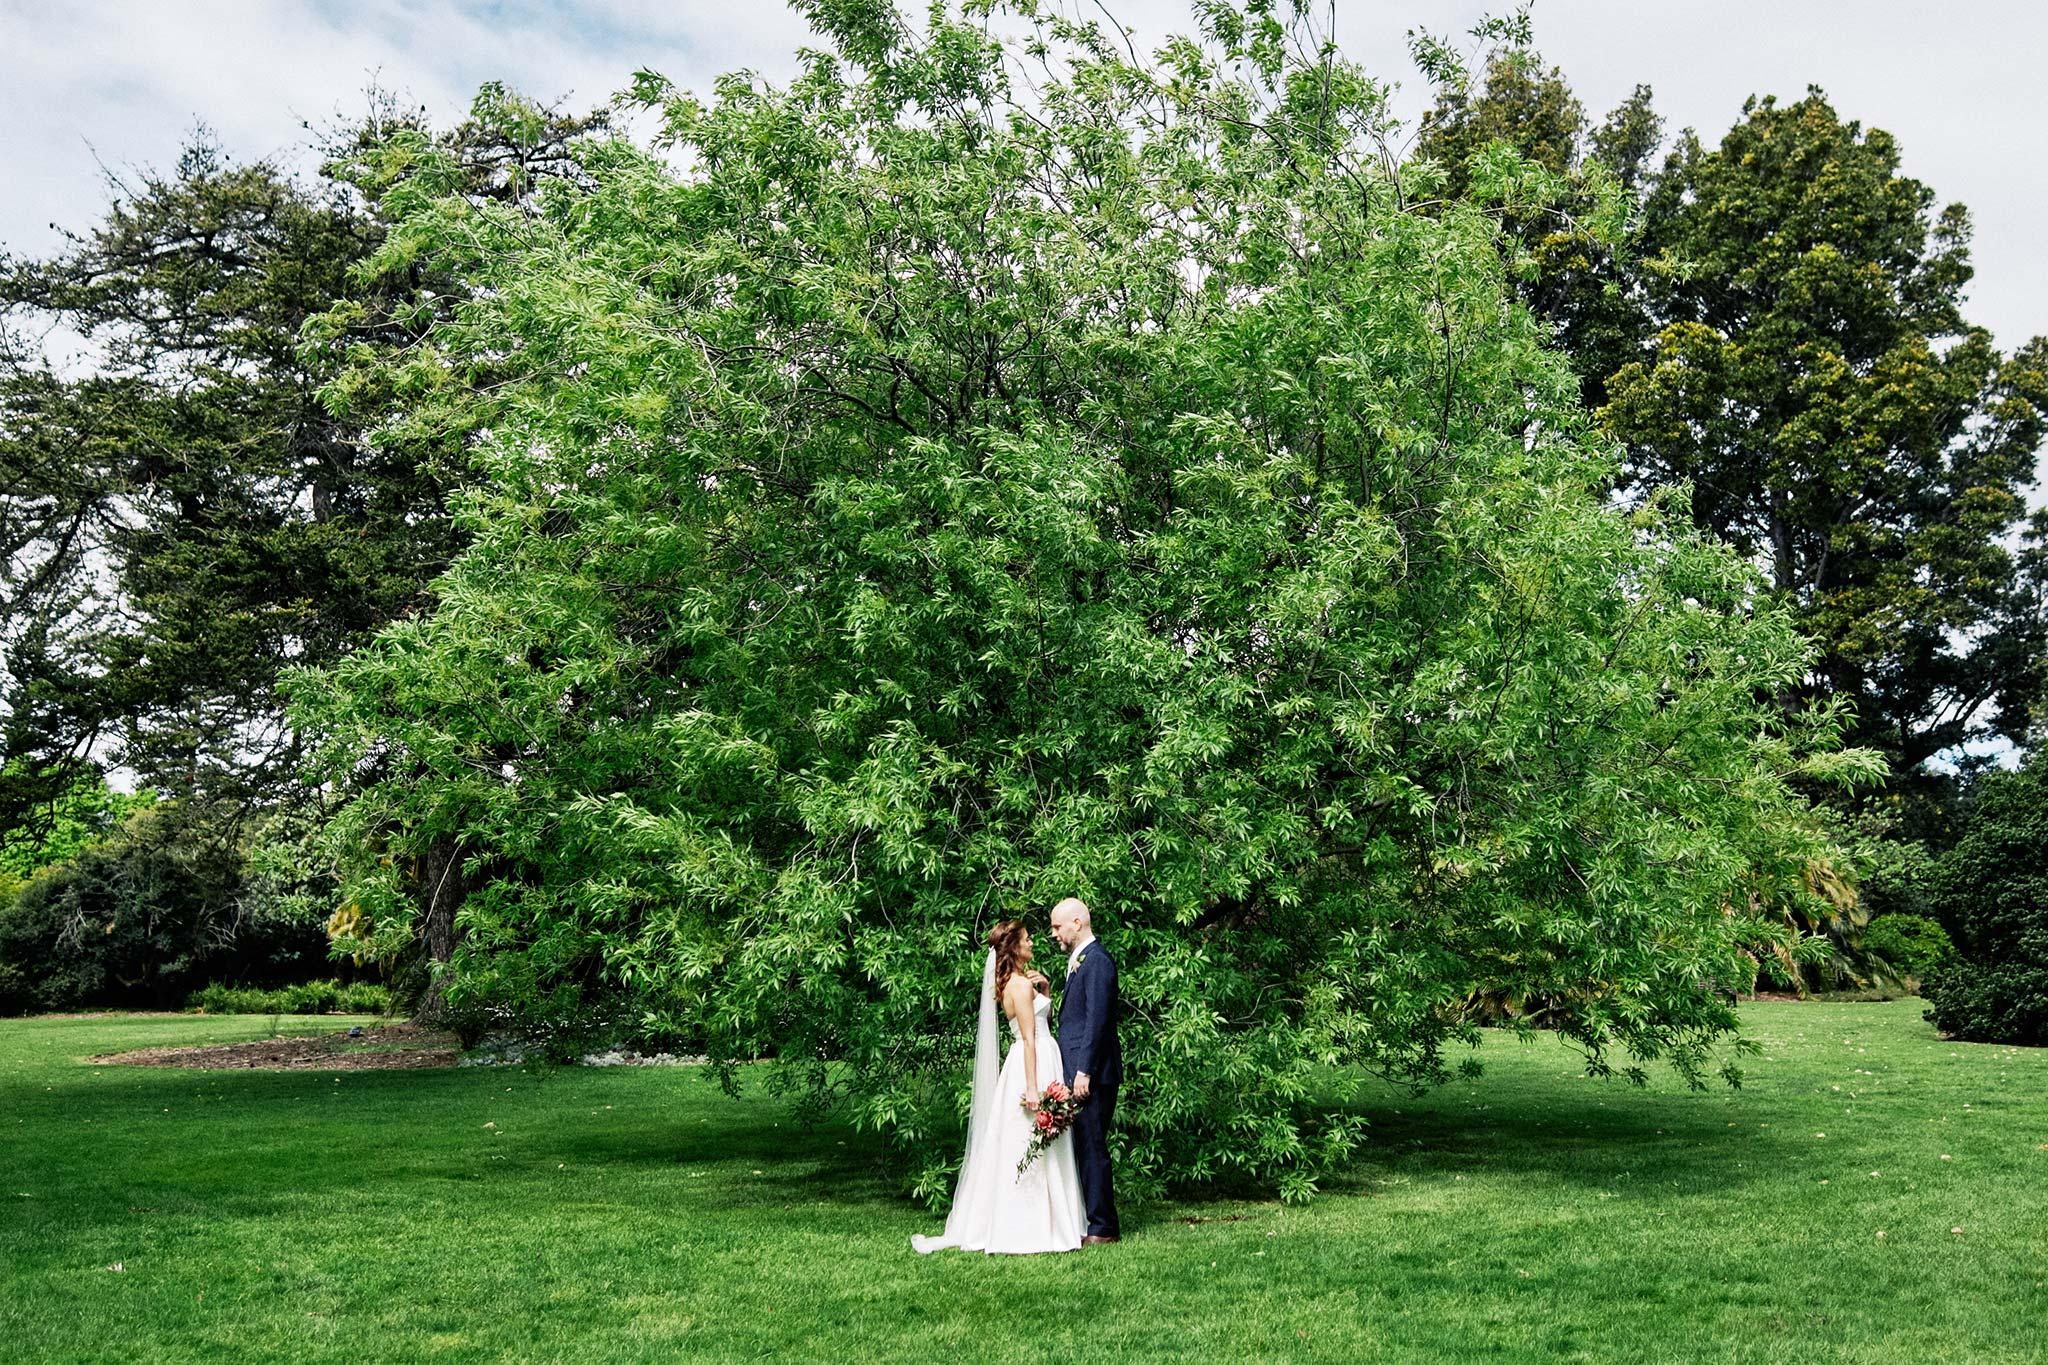 Melbourne Royal Botanical Garden Wedding Ceremony Portrait bride groom tree